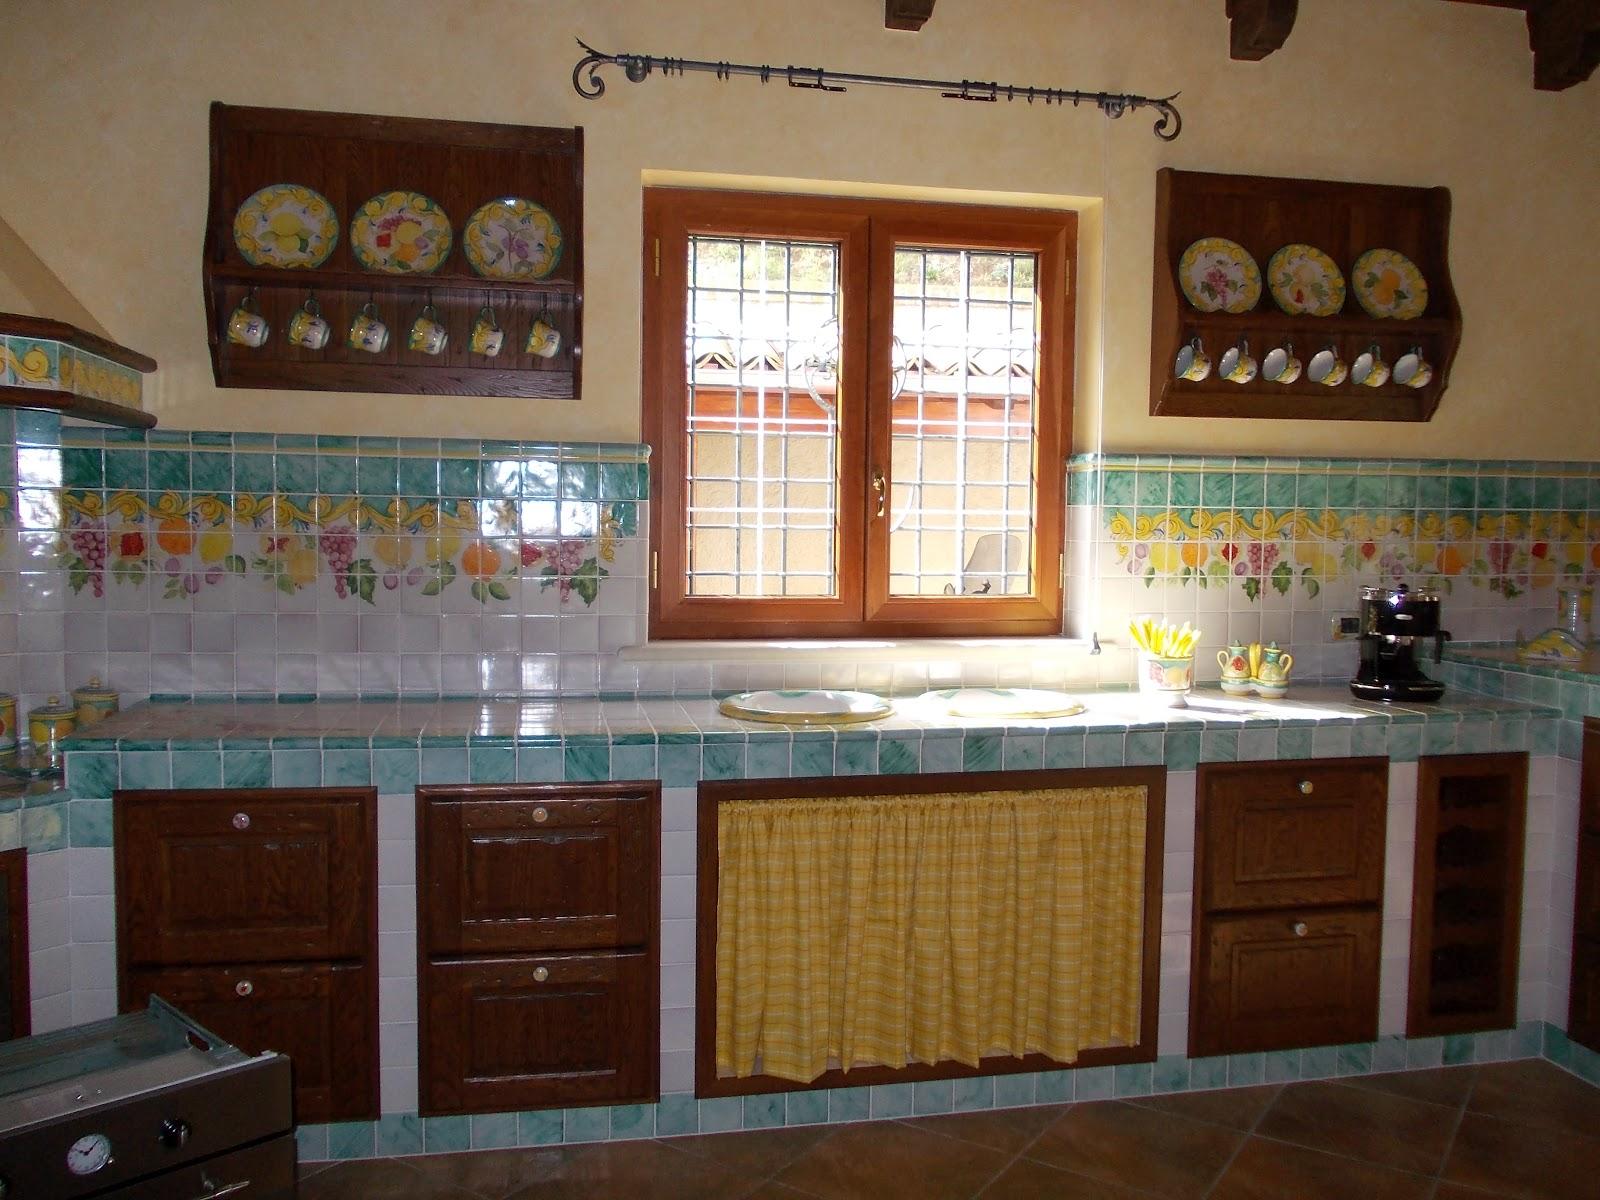 Vico condotti cucine e bagni in muratura - Cucina in muratura ...